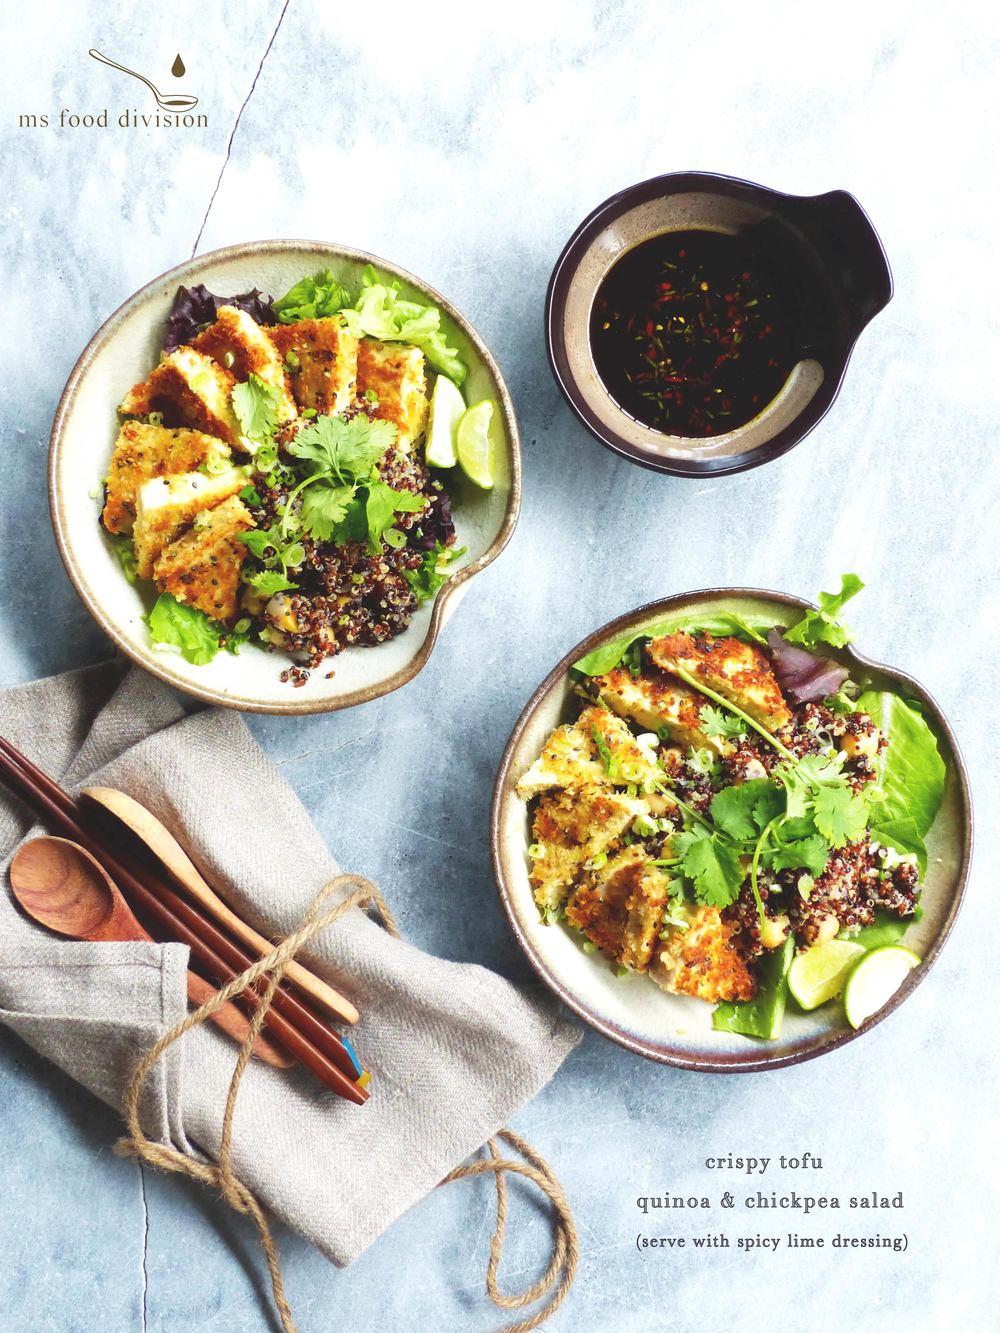 crispy tofu & quinoa salad.jpg